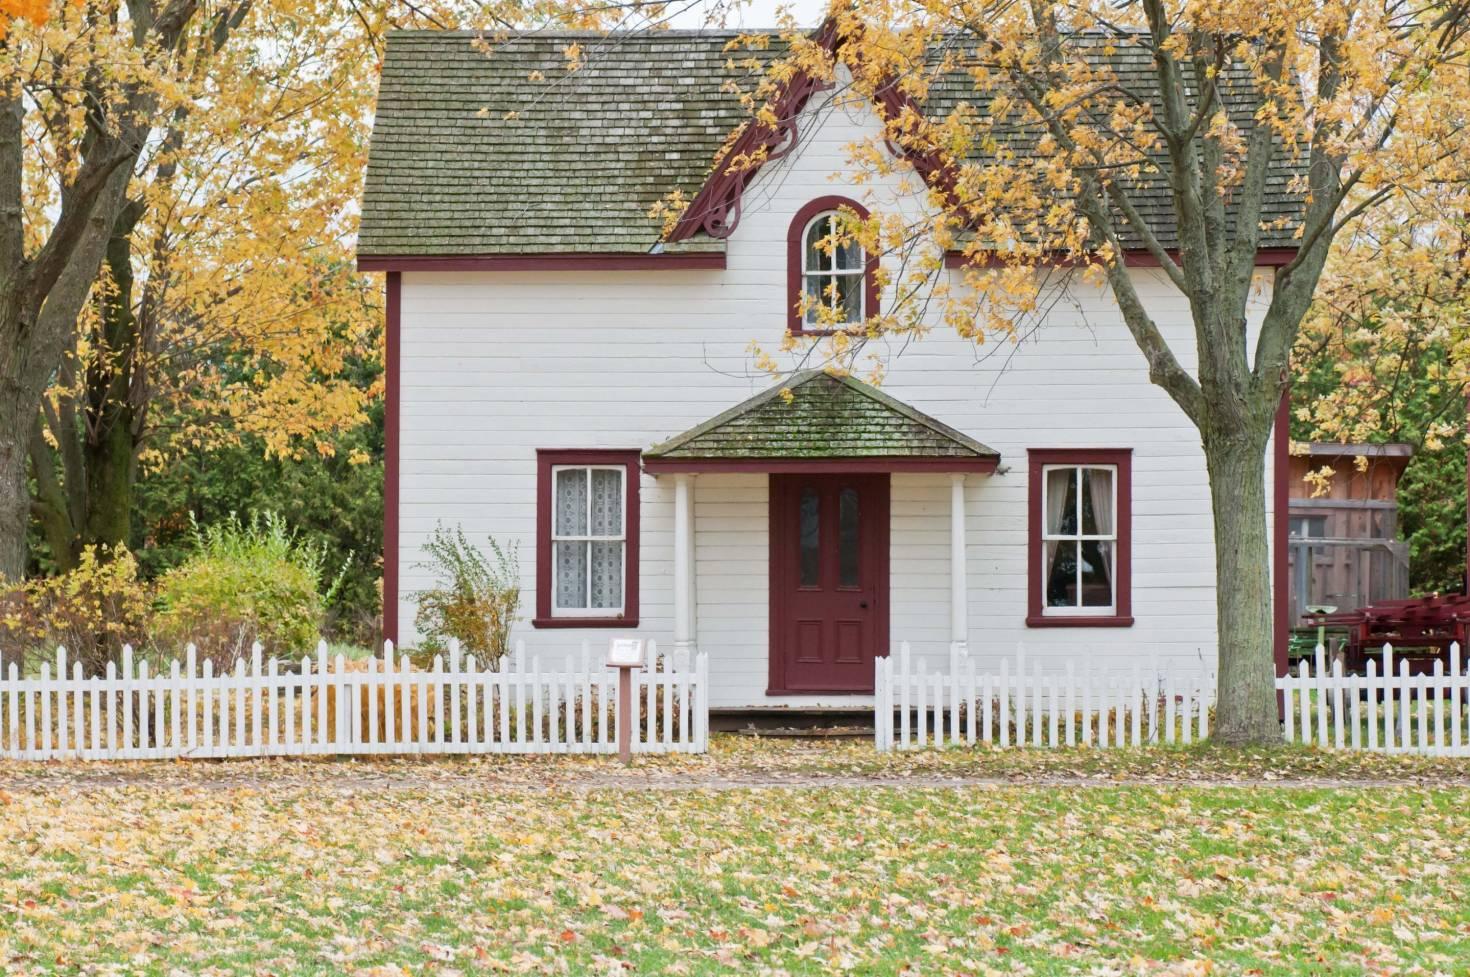 A Small White House